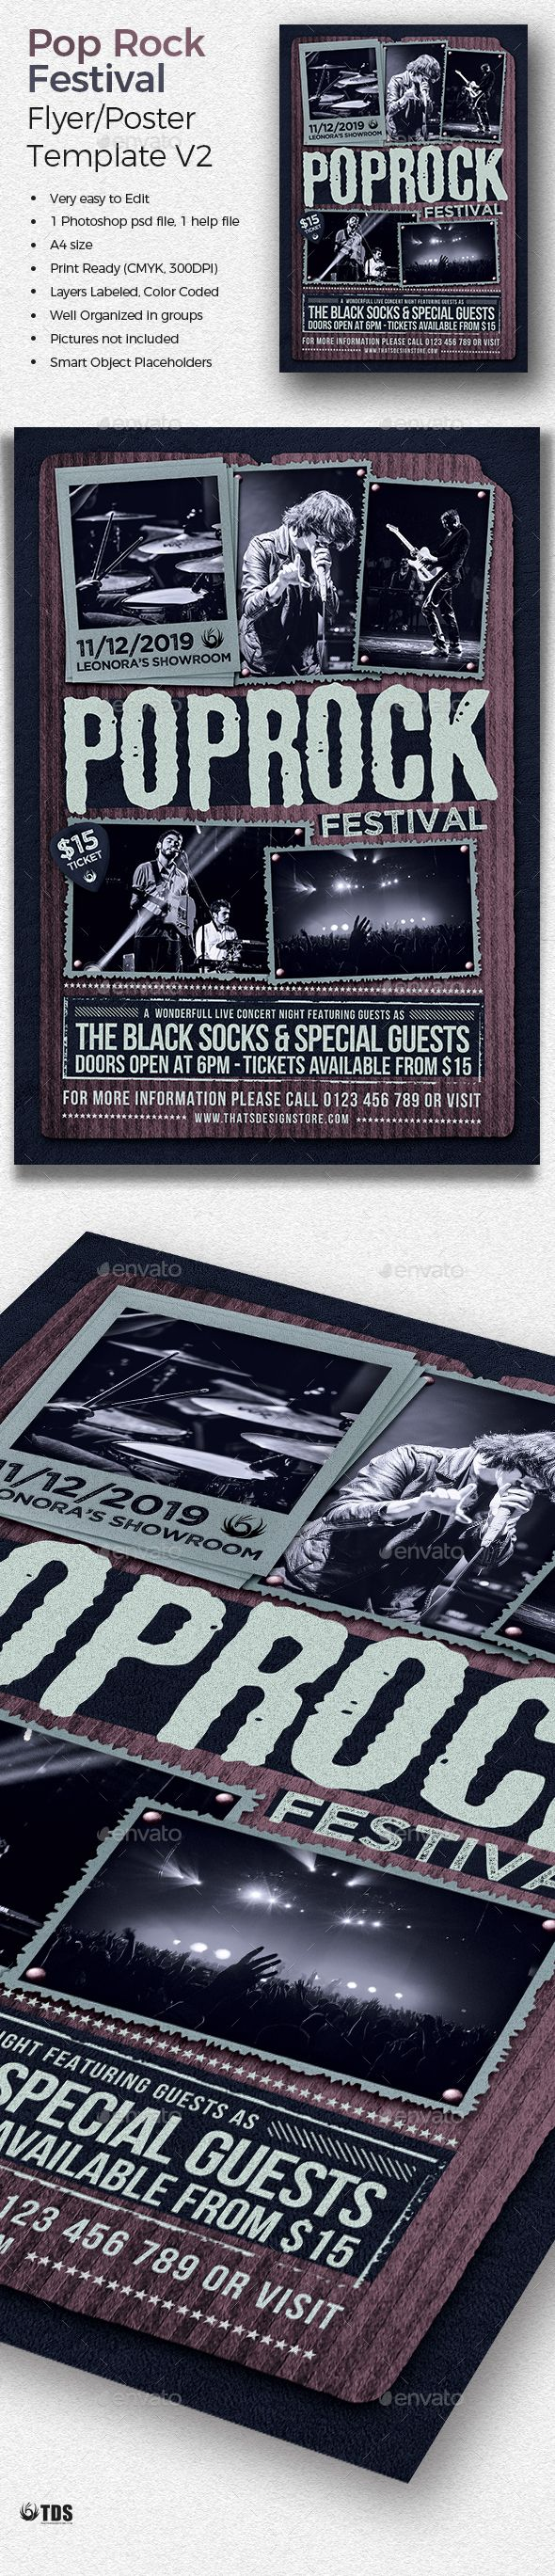 Pop Rock Festival #Flyer Template V2 - Concerts Events Download here: https://graphicriver.net/item/pop-rock-festival-flyer-template-v2/19725240?ref=alena994